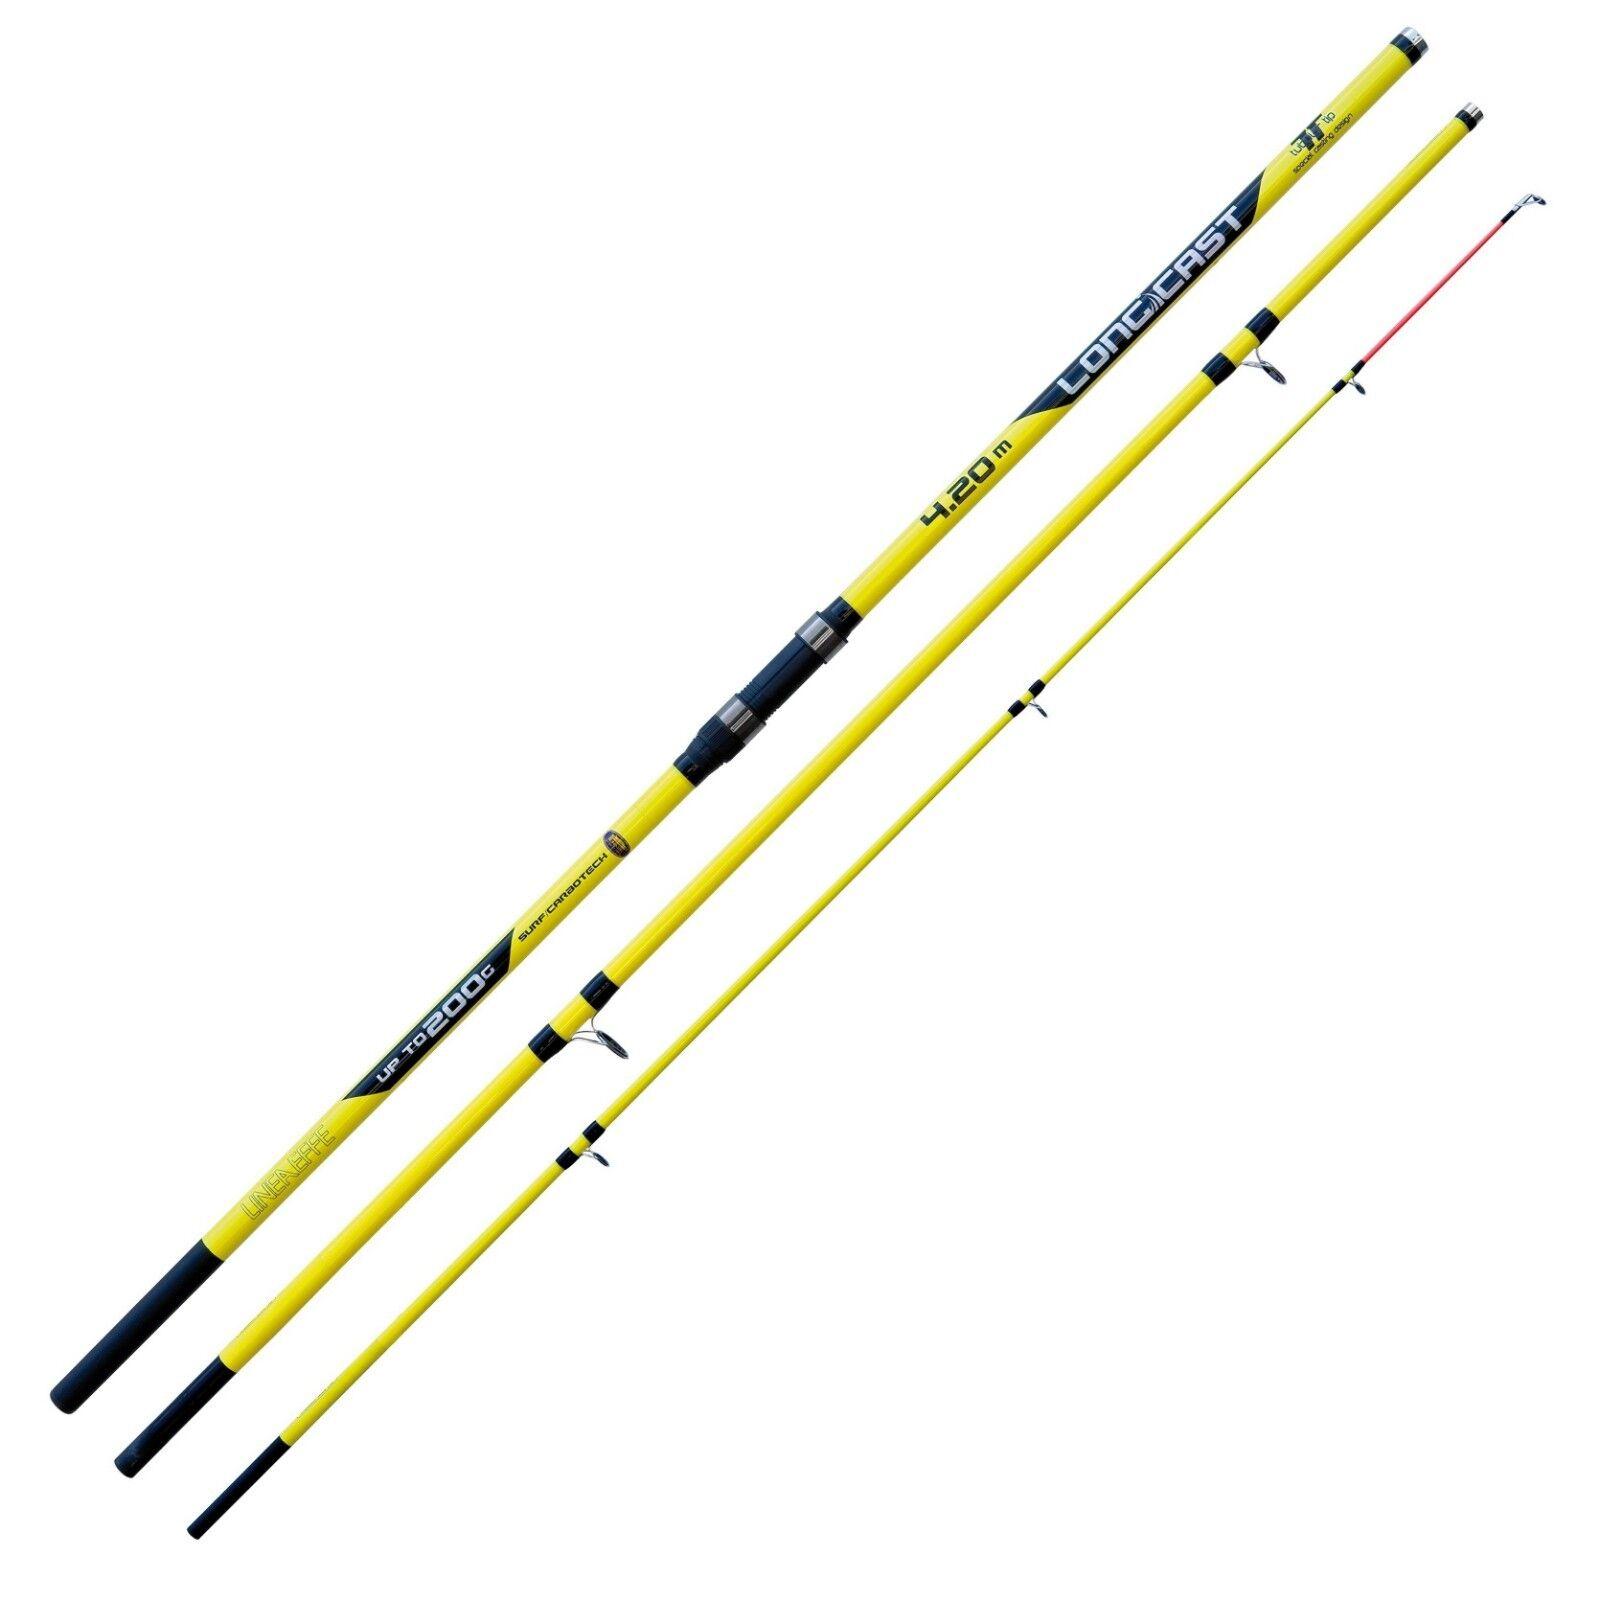 Lineaeffe Longcast 420 / 4.2m 3pc Beachcaster / Surf Fishing Rod - 2289242